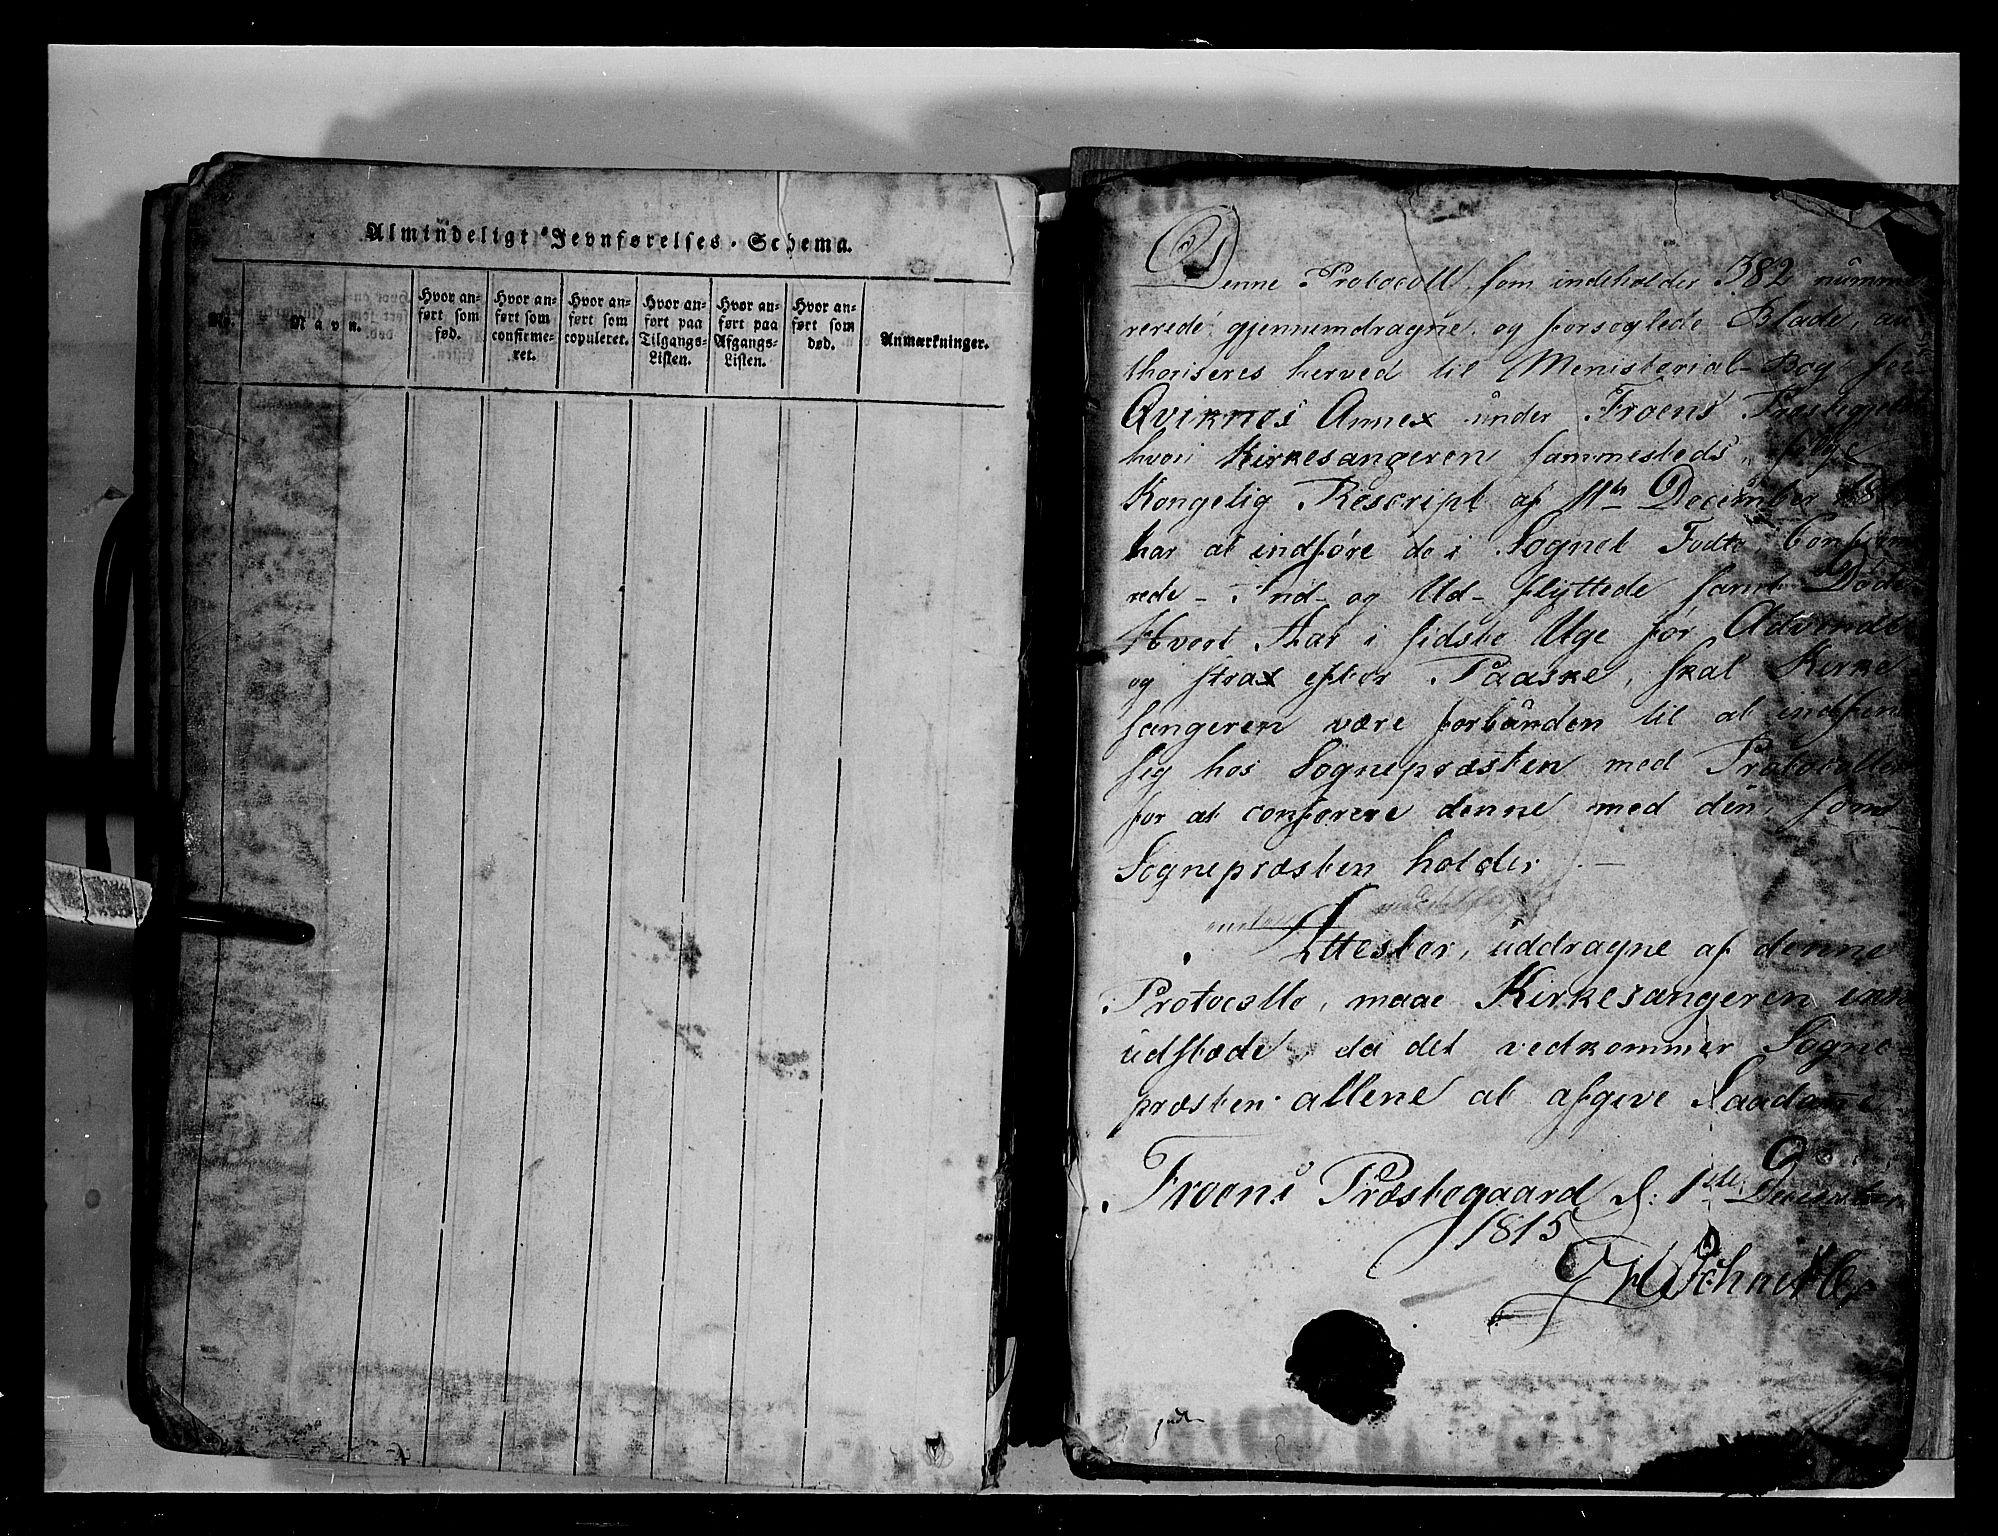 SAH, Fron prestekontor, H/Ha/Hab/L0003: Klokkerbok nr. 3, 1816-1850